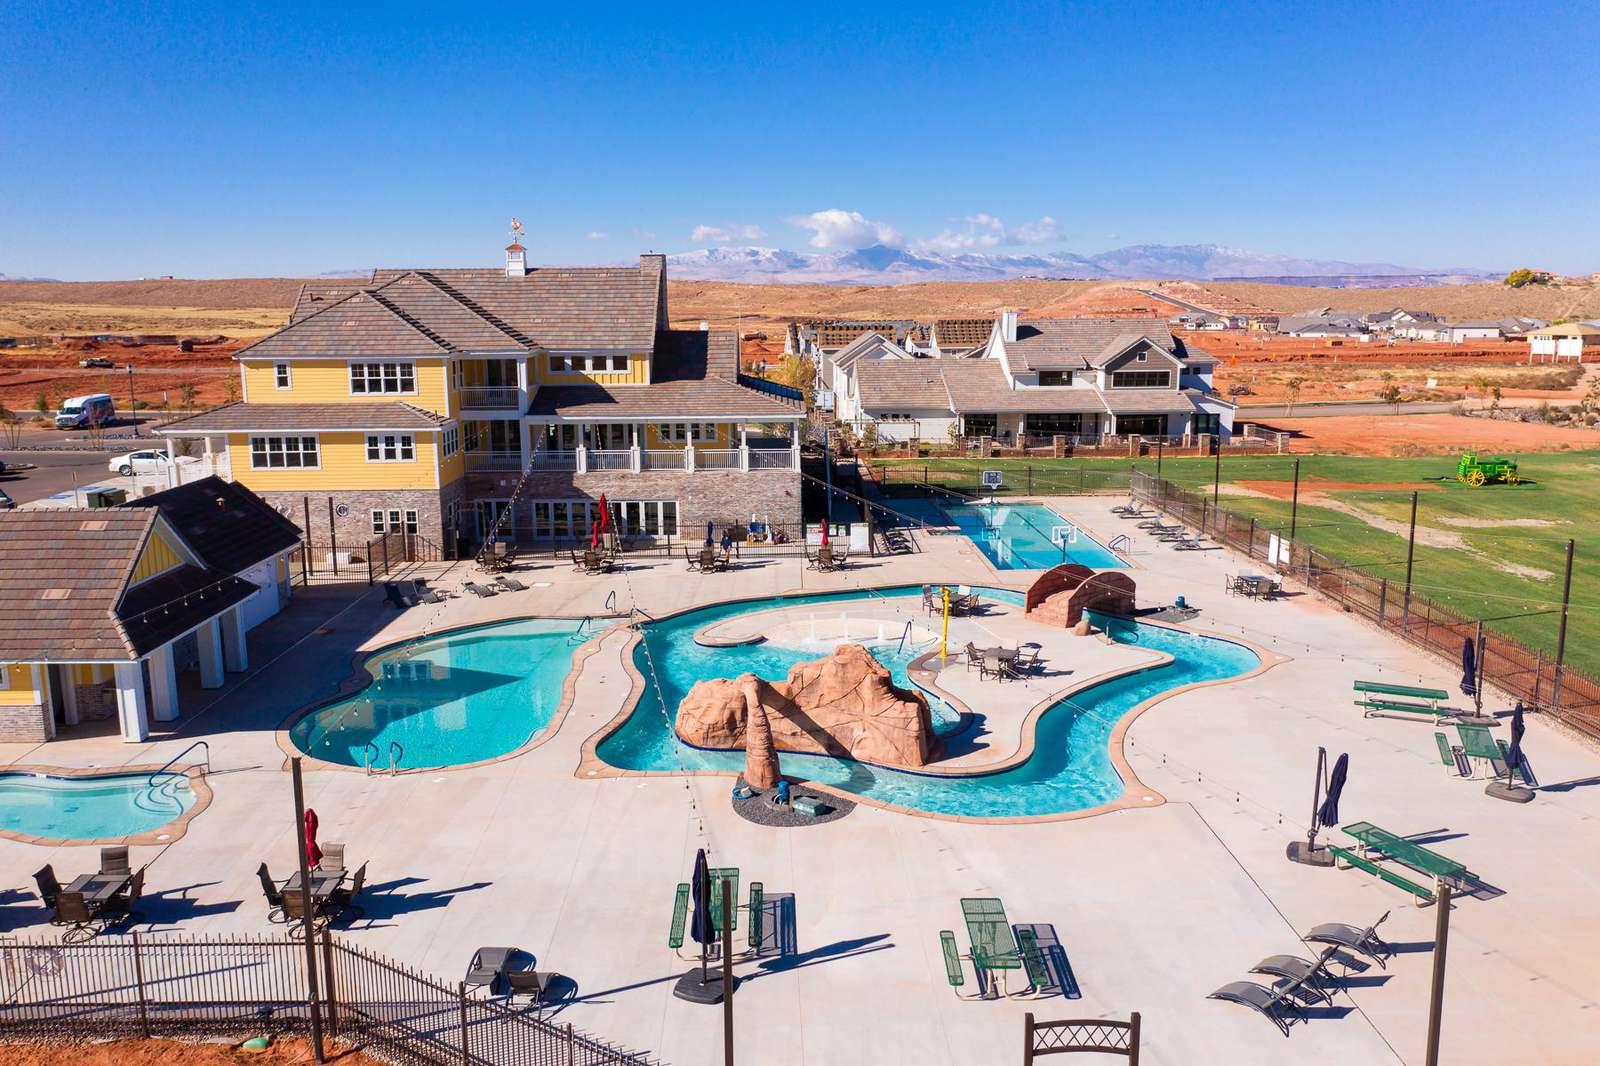 Resort Pool and Farm House